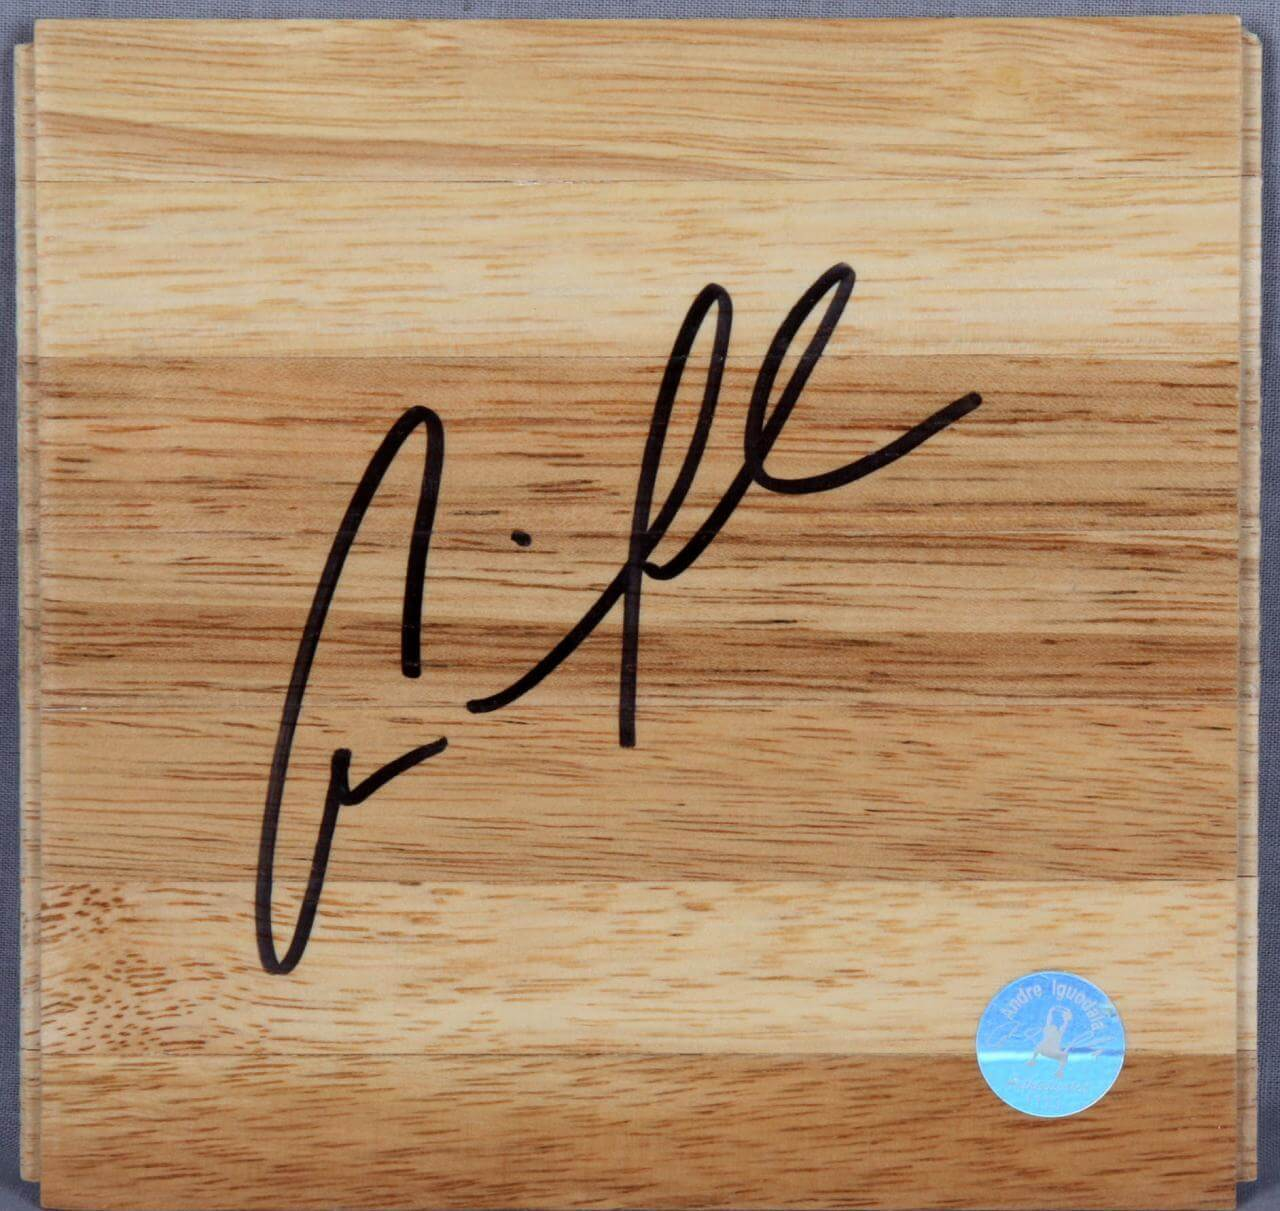 Andre Iguodala 76ers Signed  Wood Floor Player's Hologram & Letter